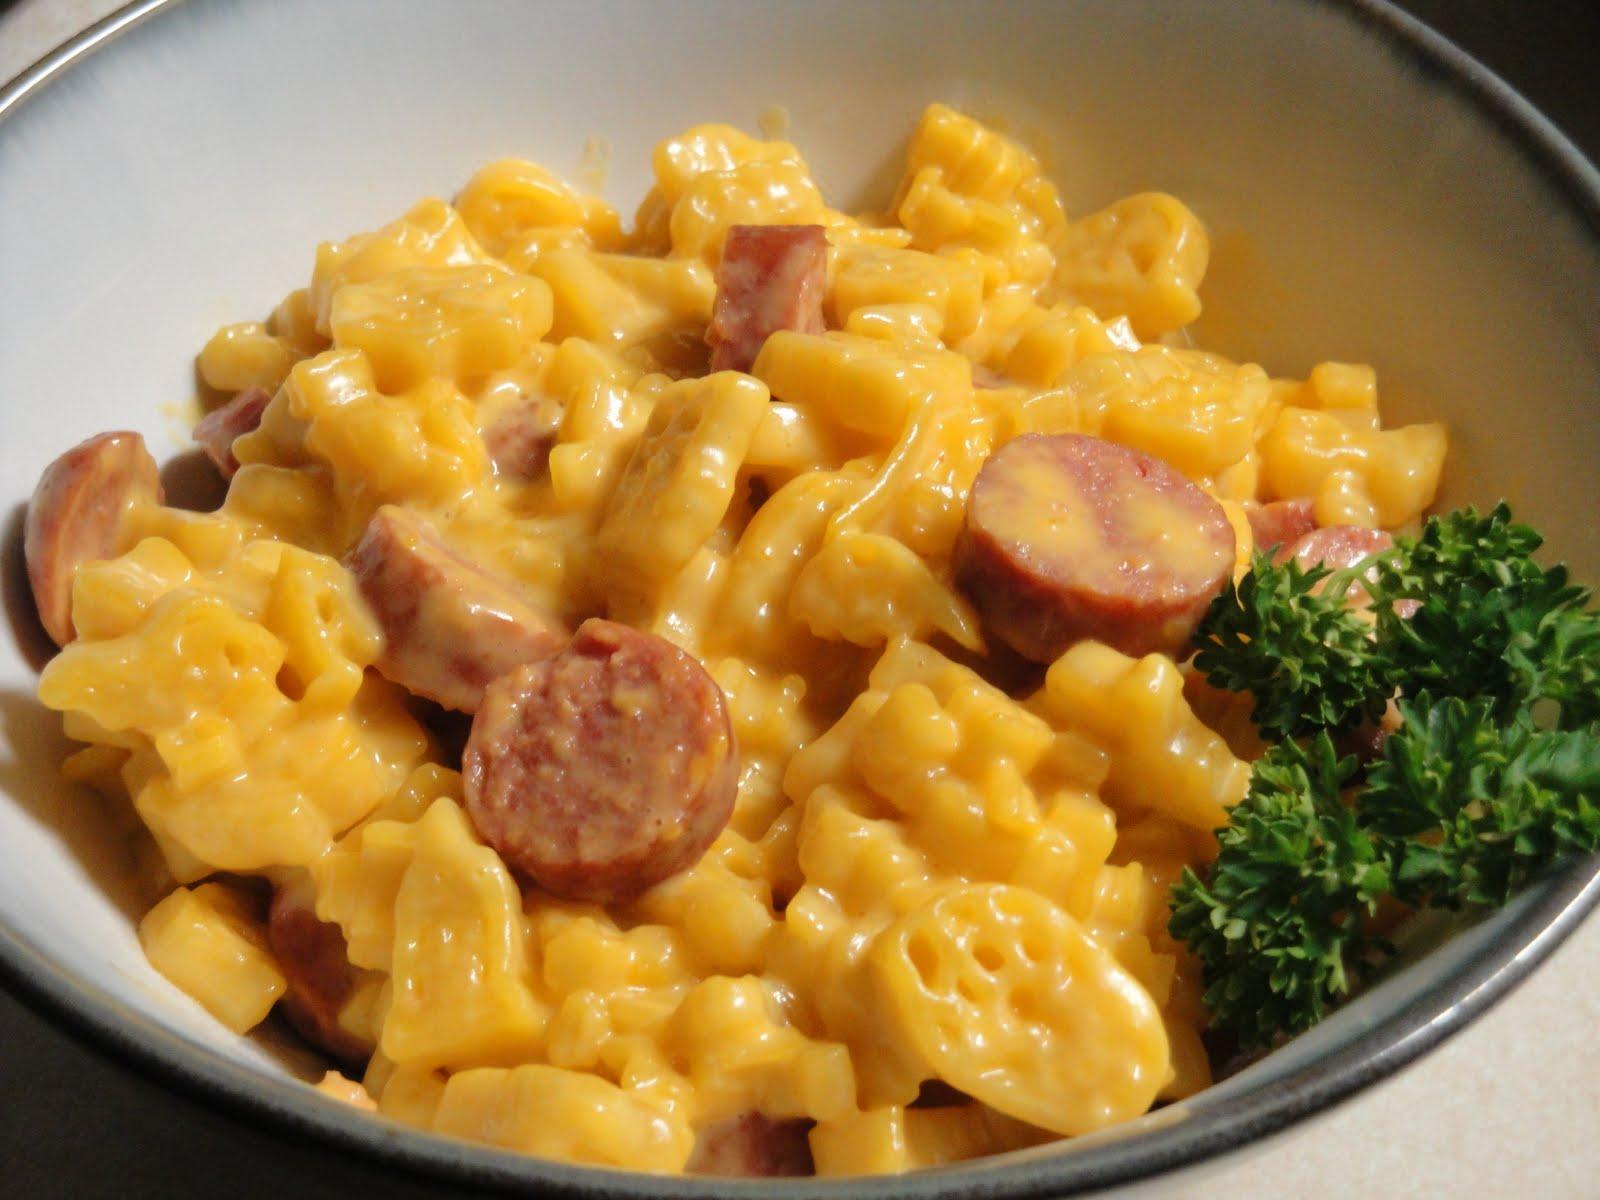 Hot Dog Soup With Macaroni